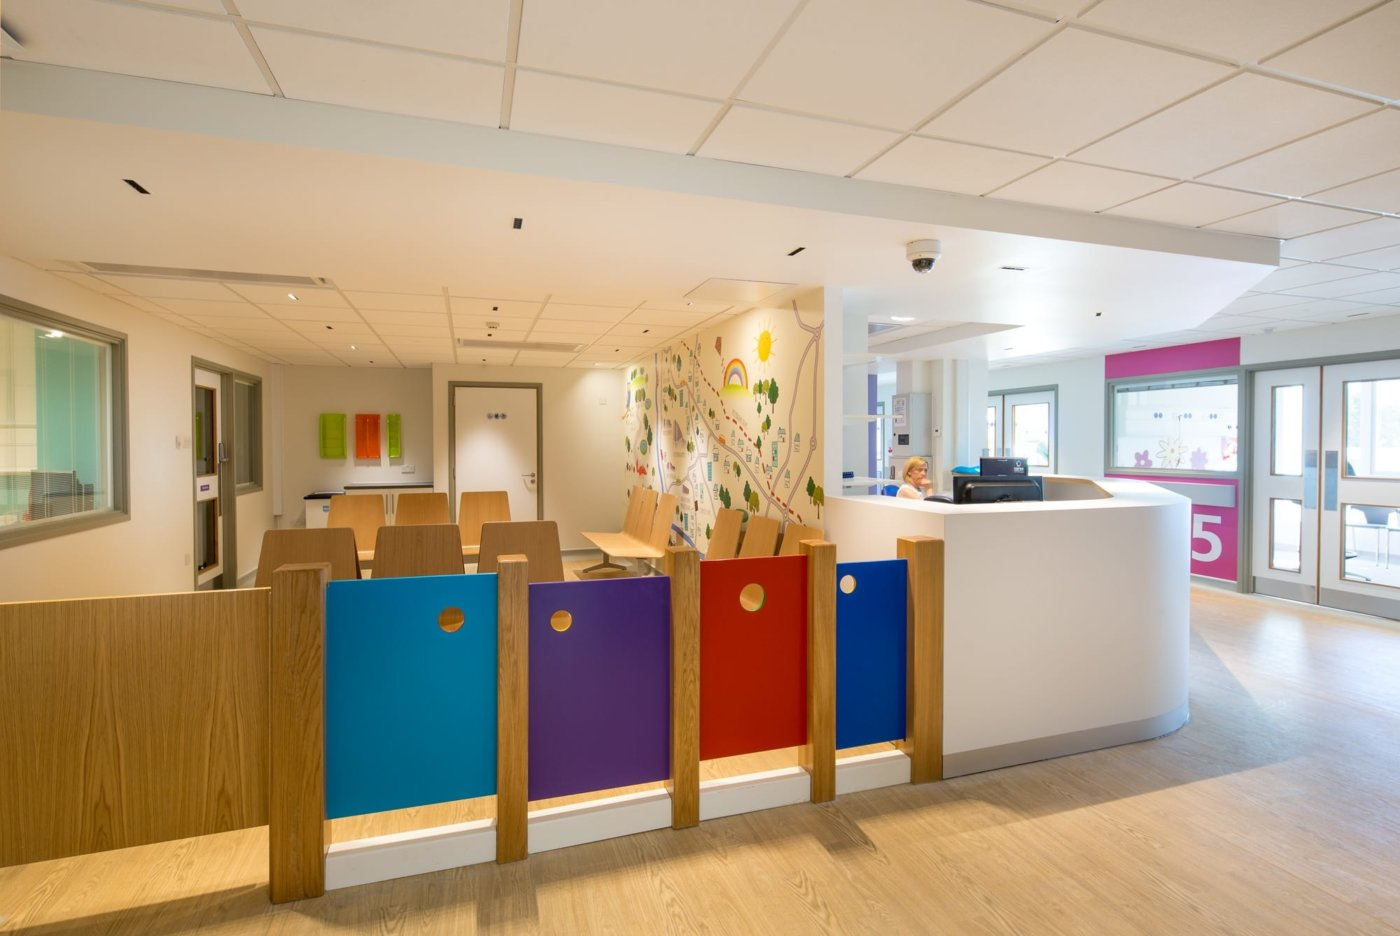 New Paediatric A&E Department